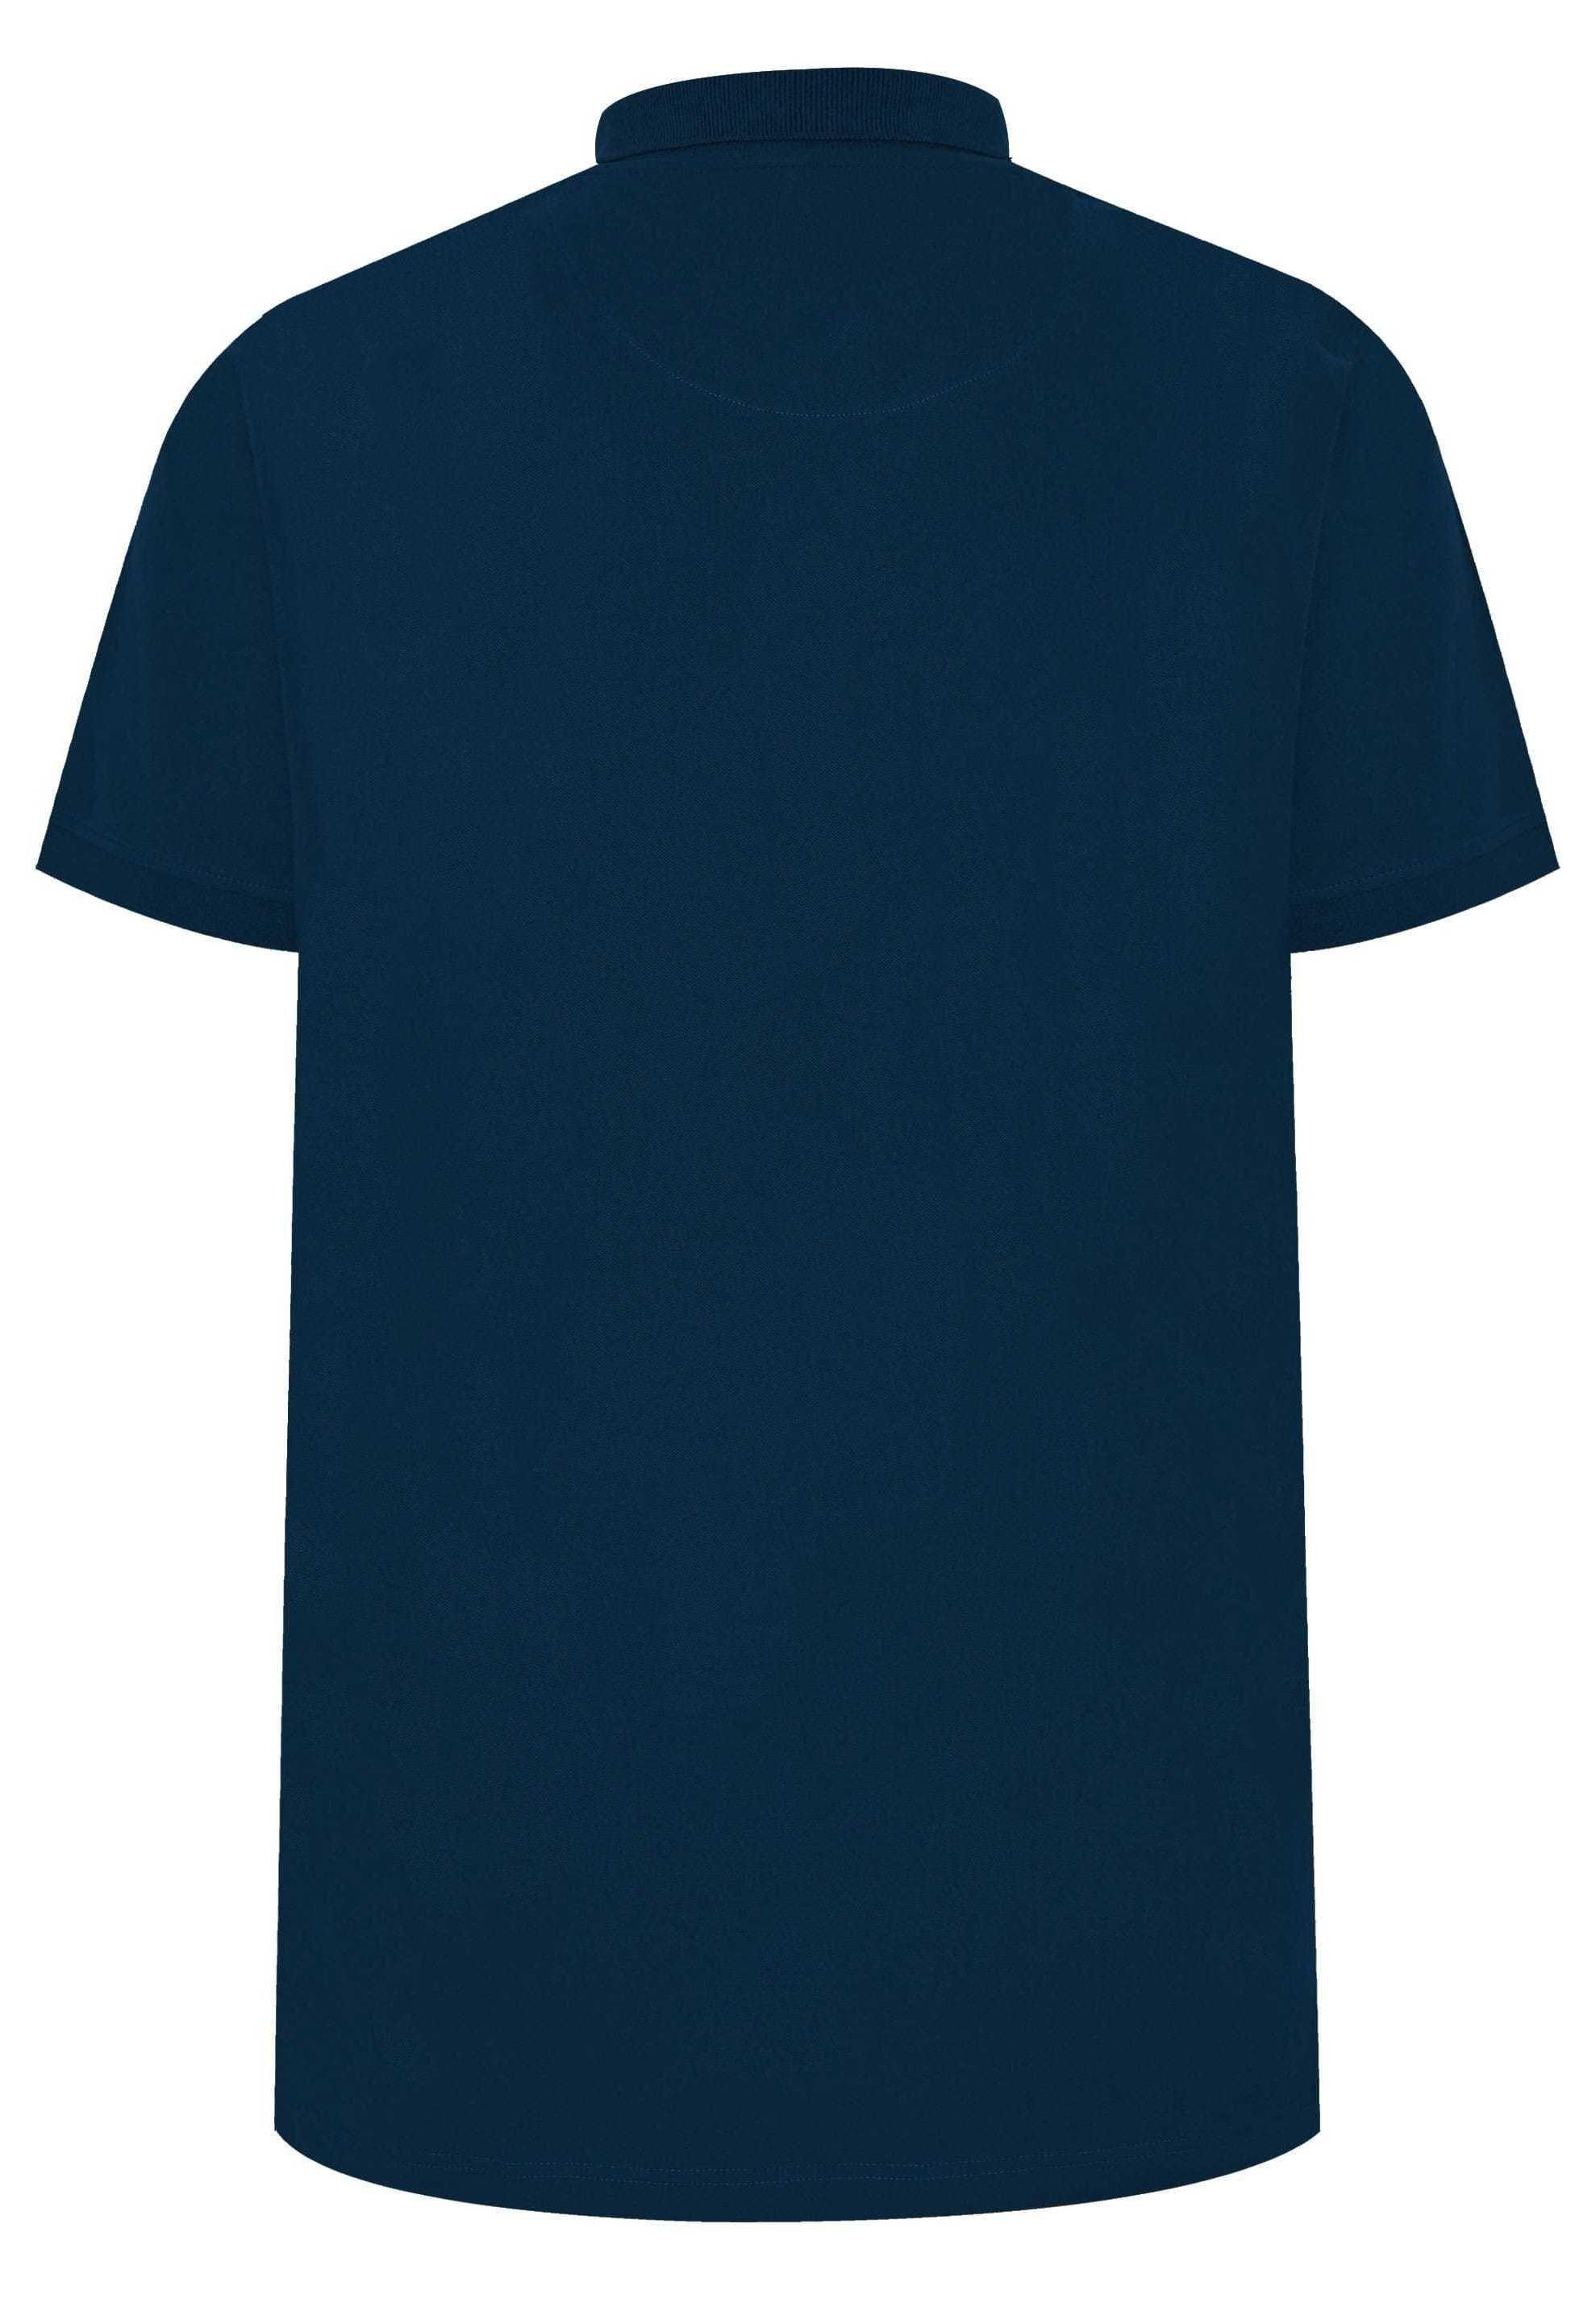 BadRhino Polo shirt - blue 0I47v